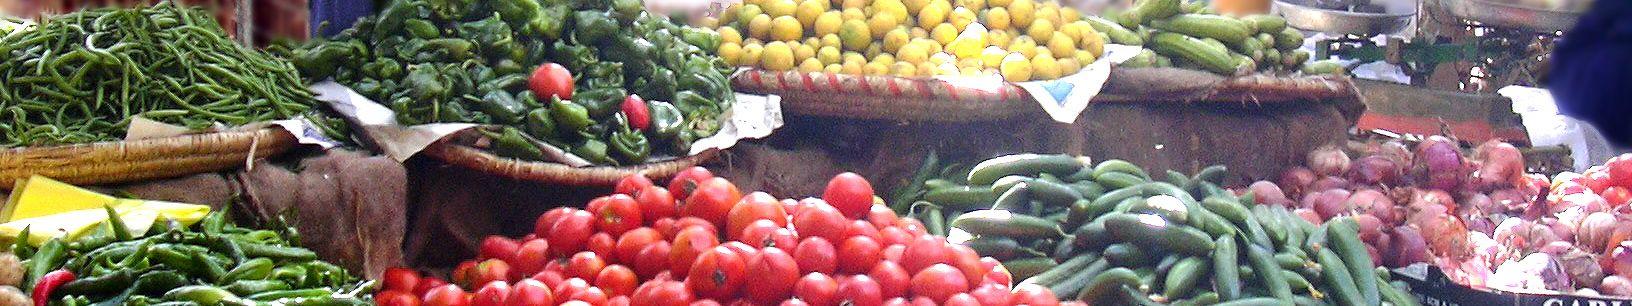 Tastes of Egyptian Foods by Season